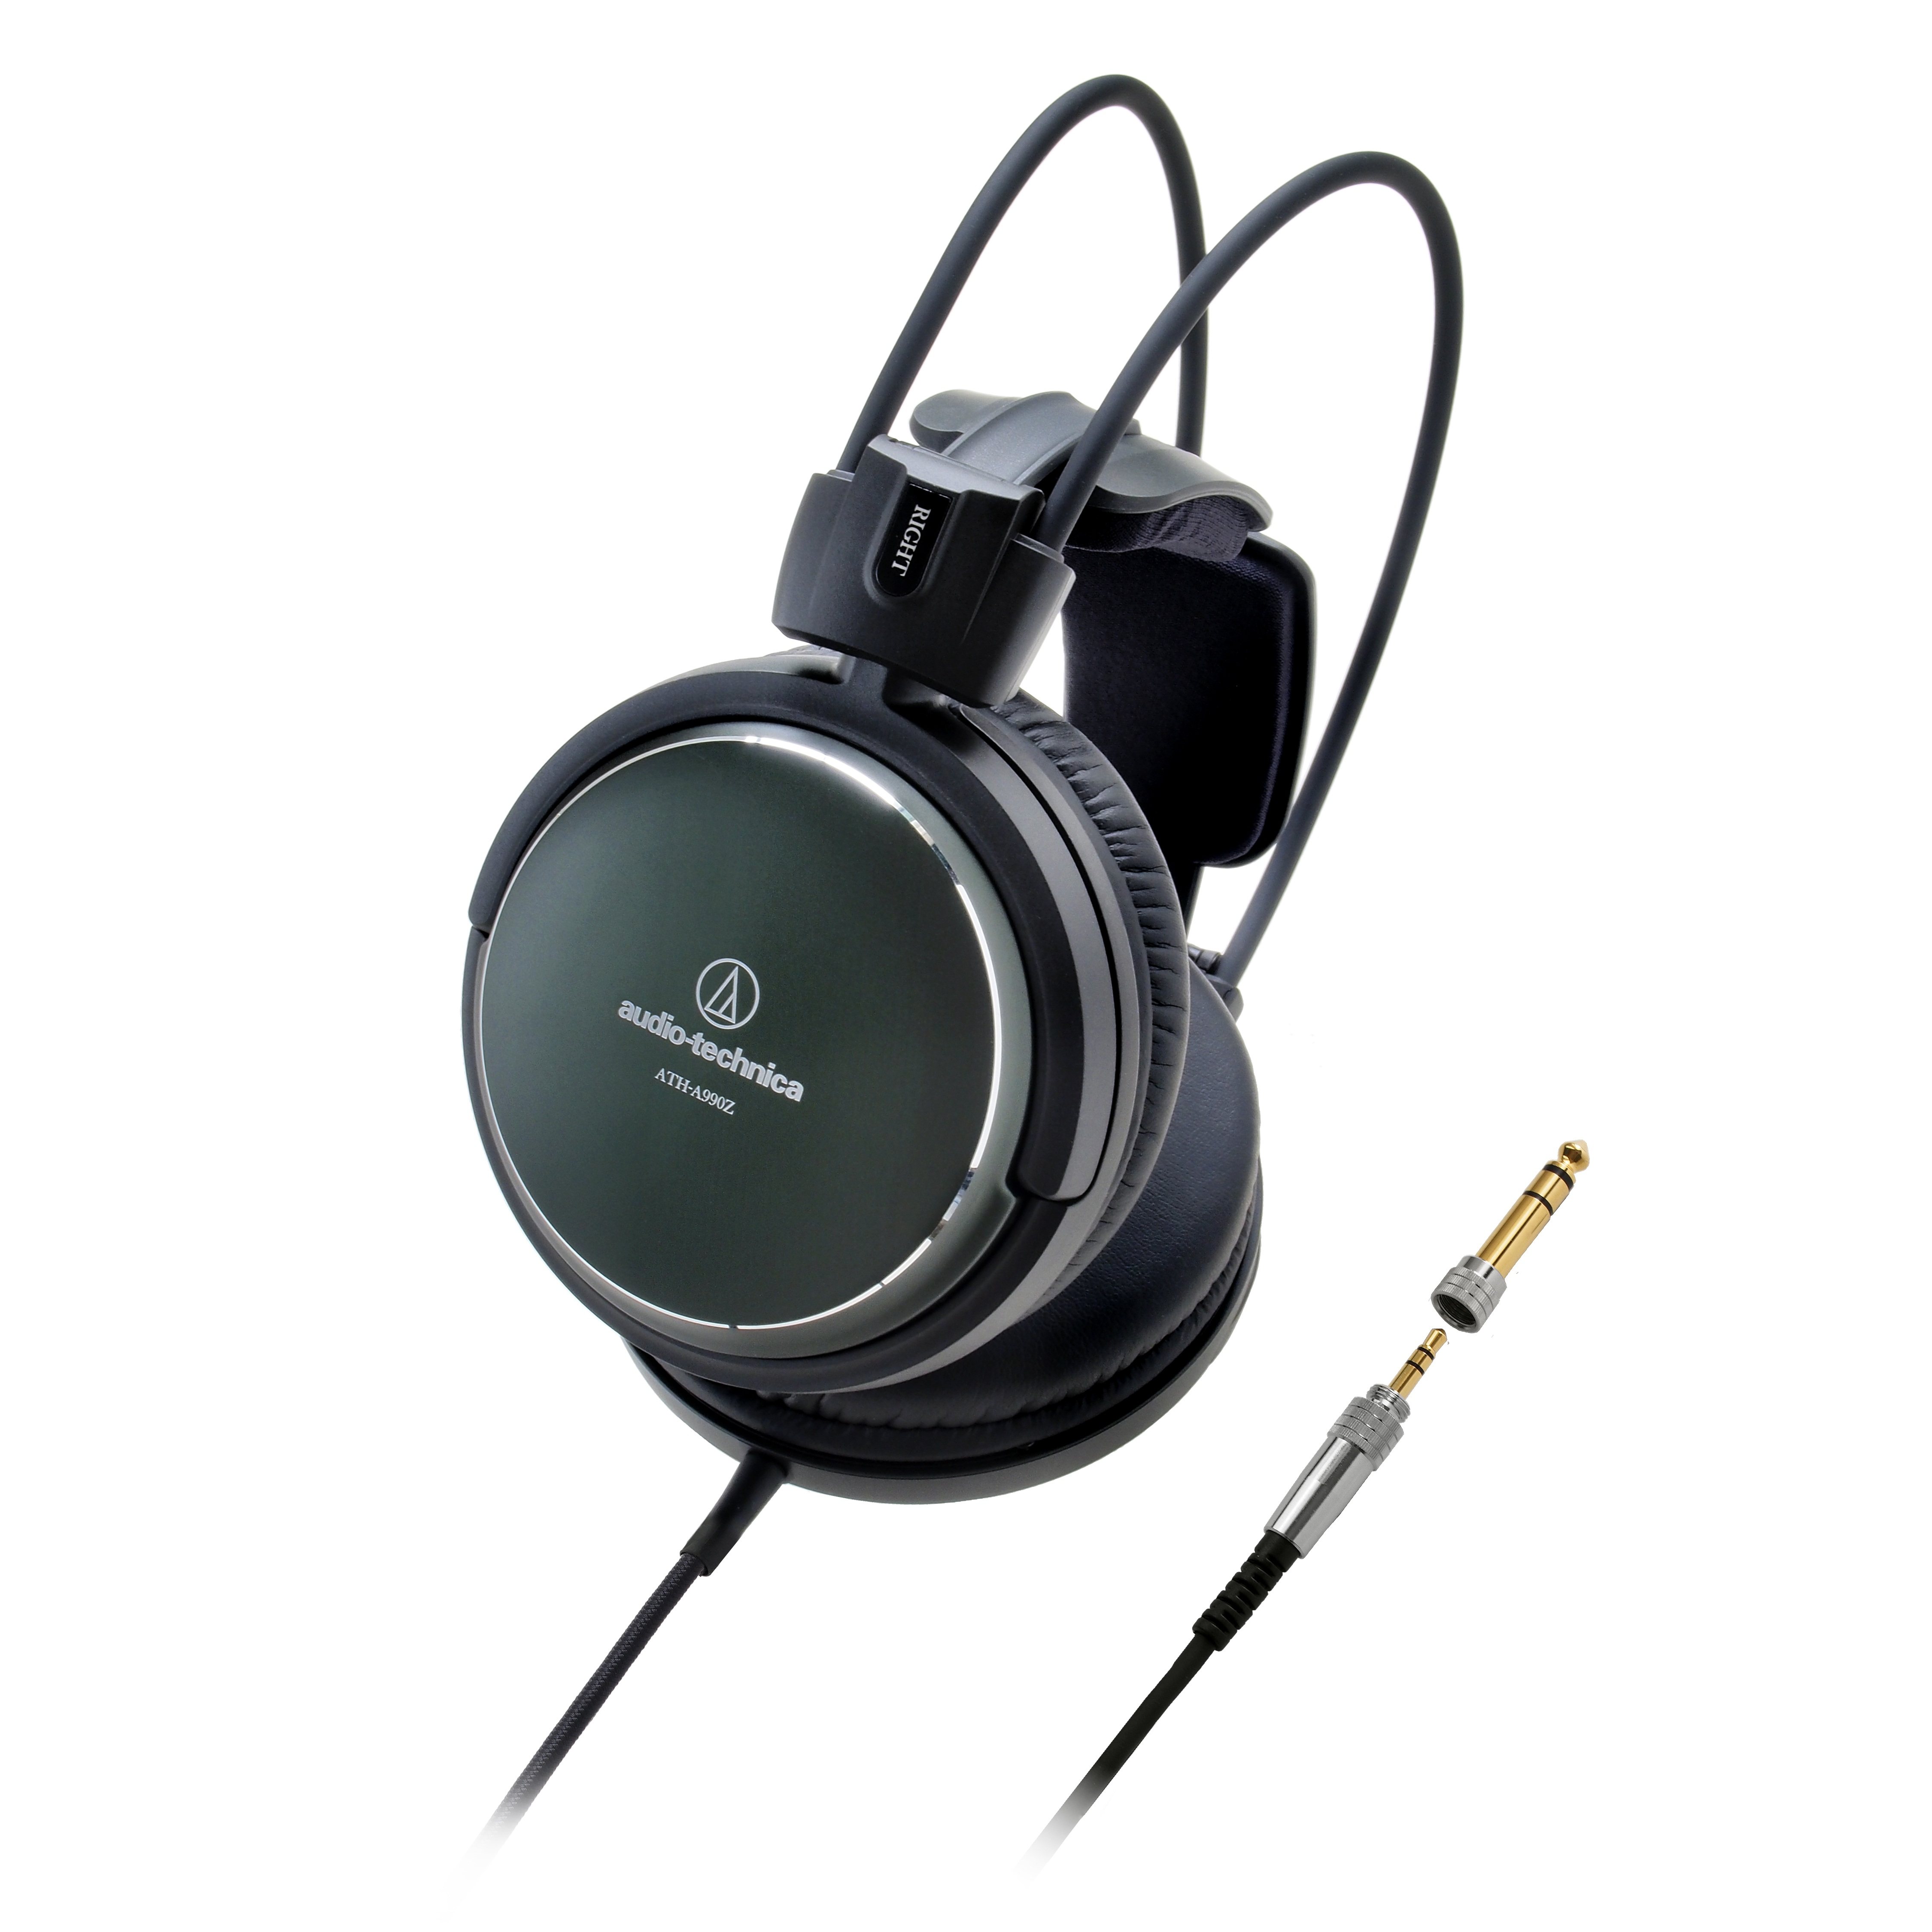 Audio-technica ATH-A990z 7c78c2afd32a